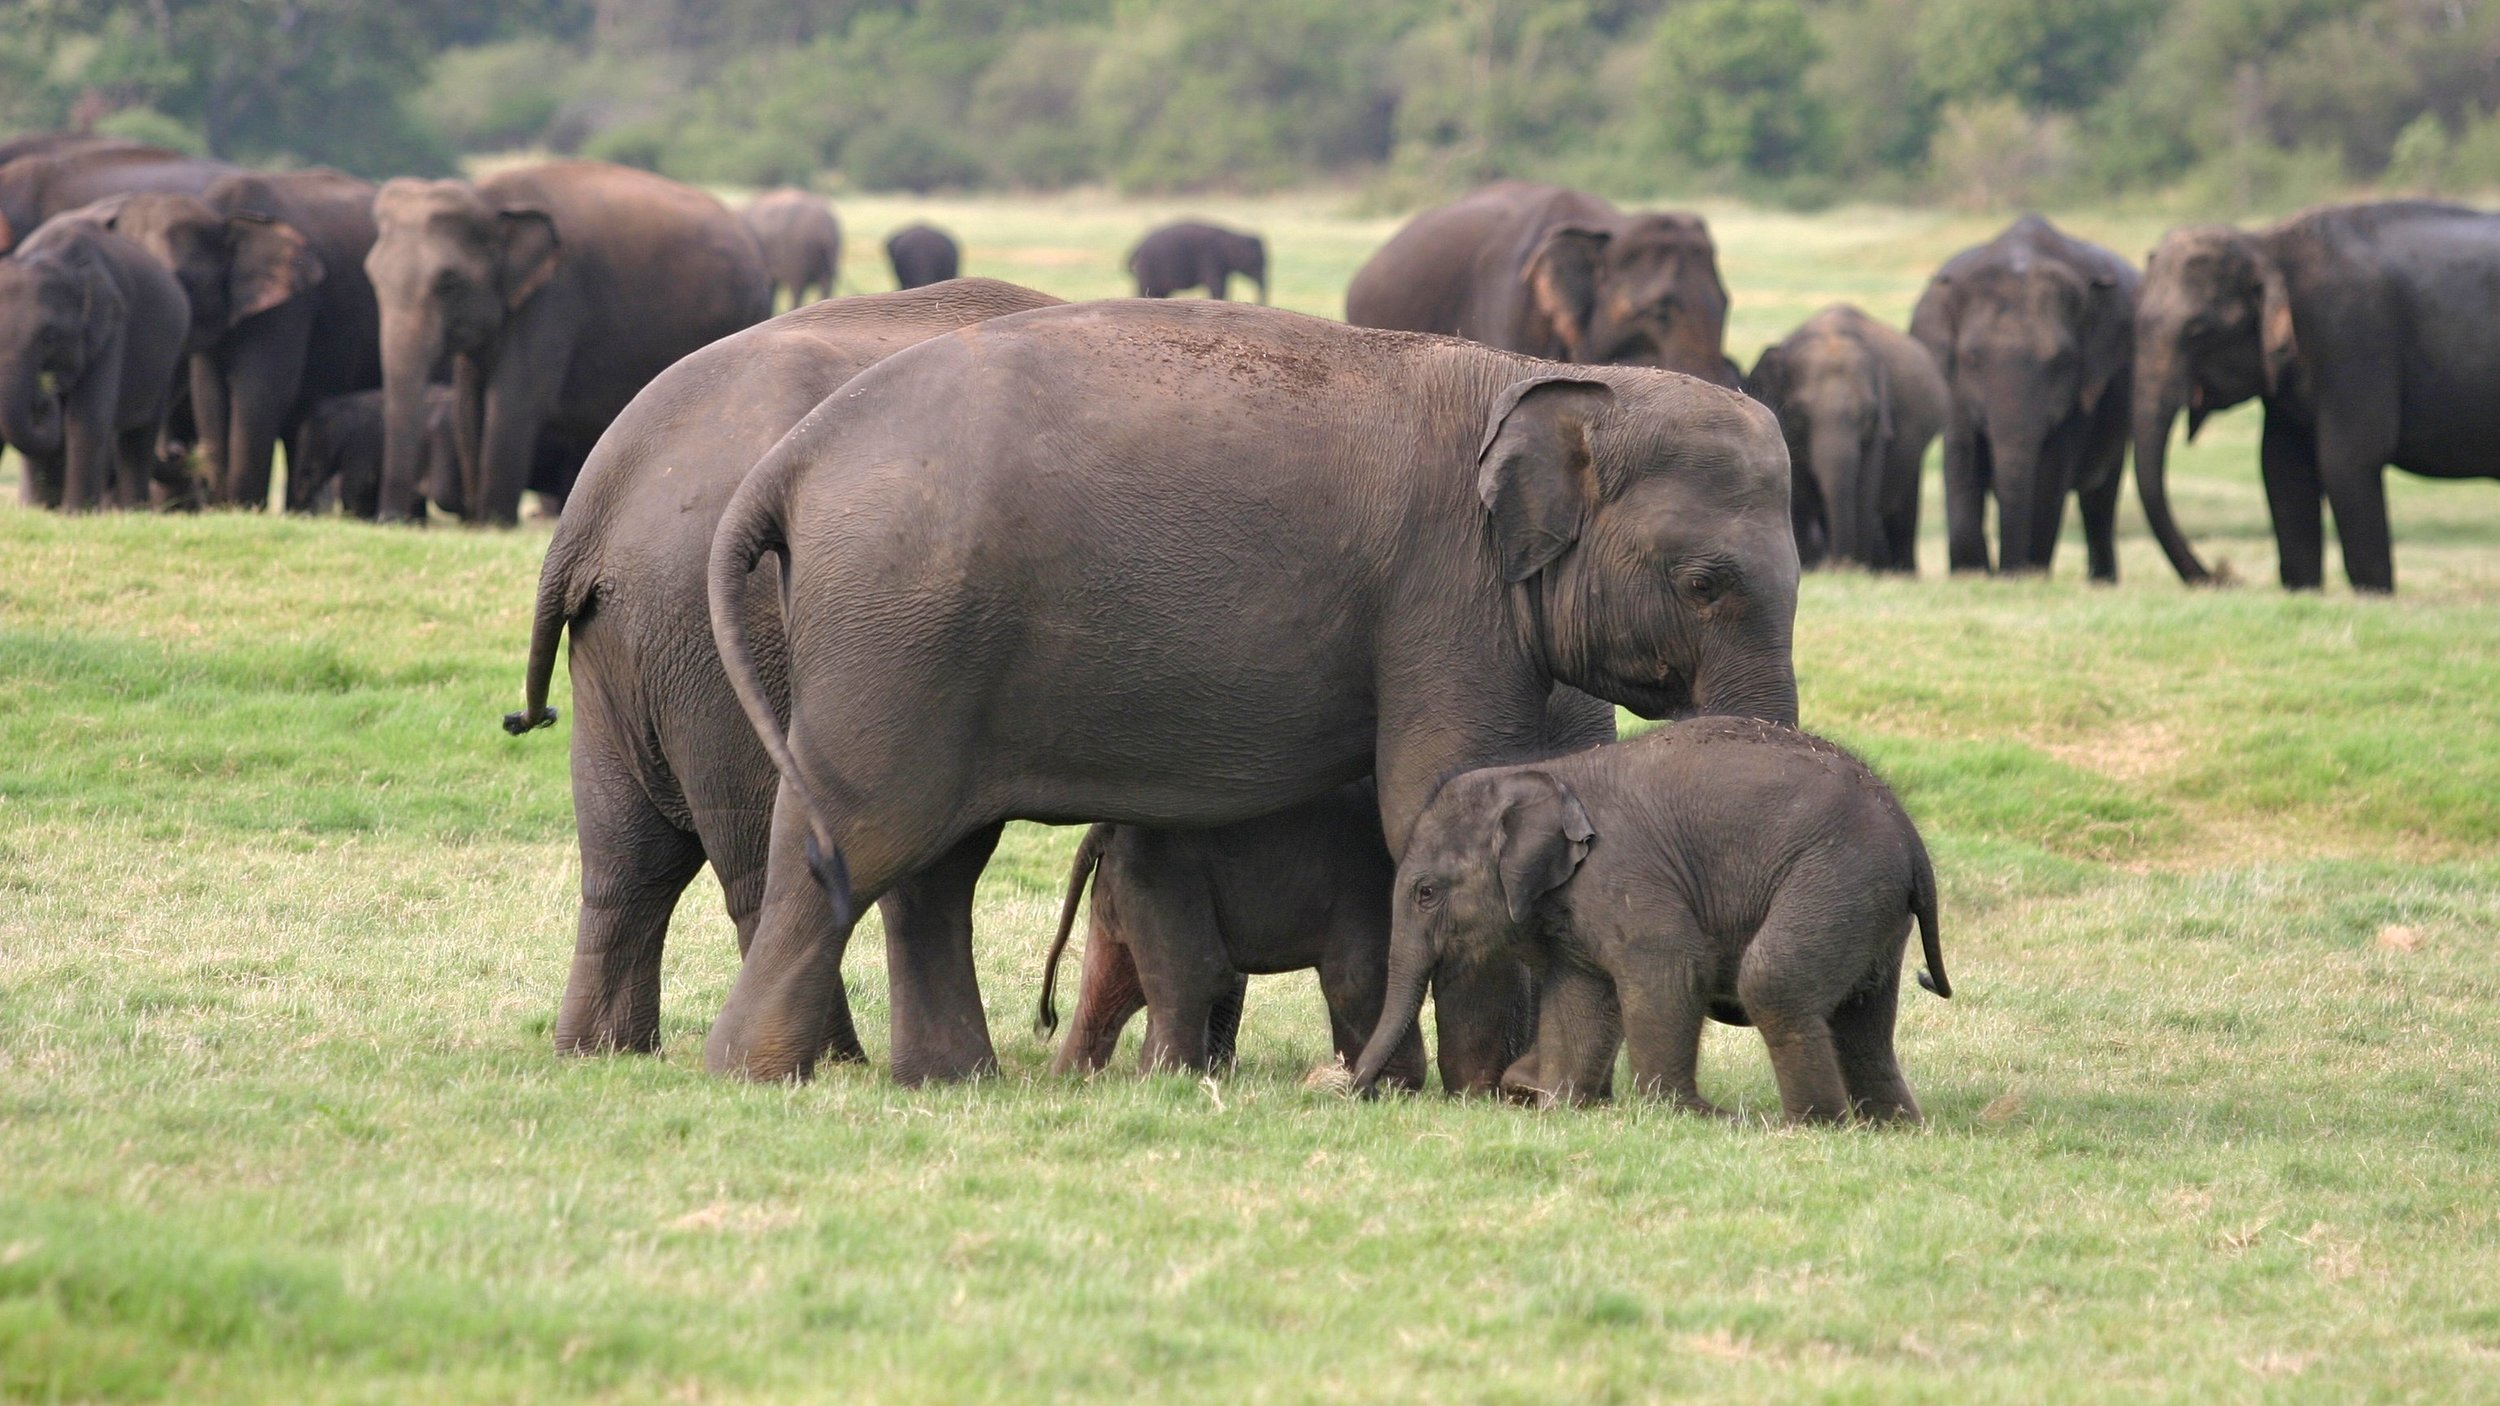 invite-to-paradise-sri-lanka-honeymoon-holiday-elephant-safari.jpg